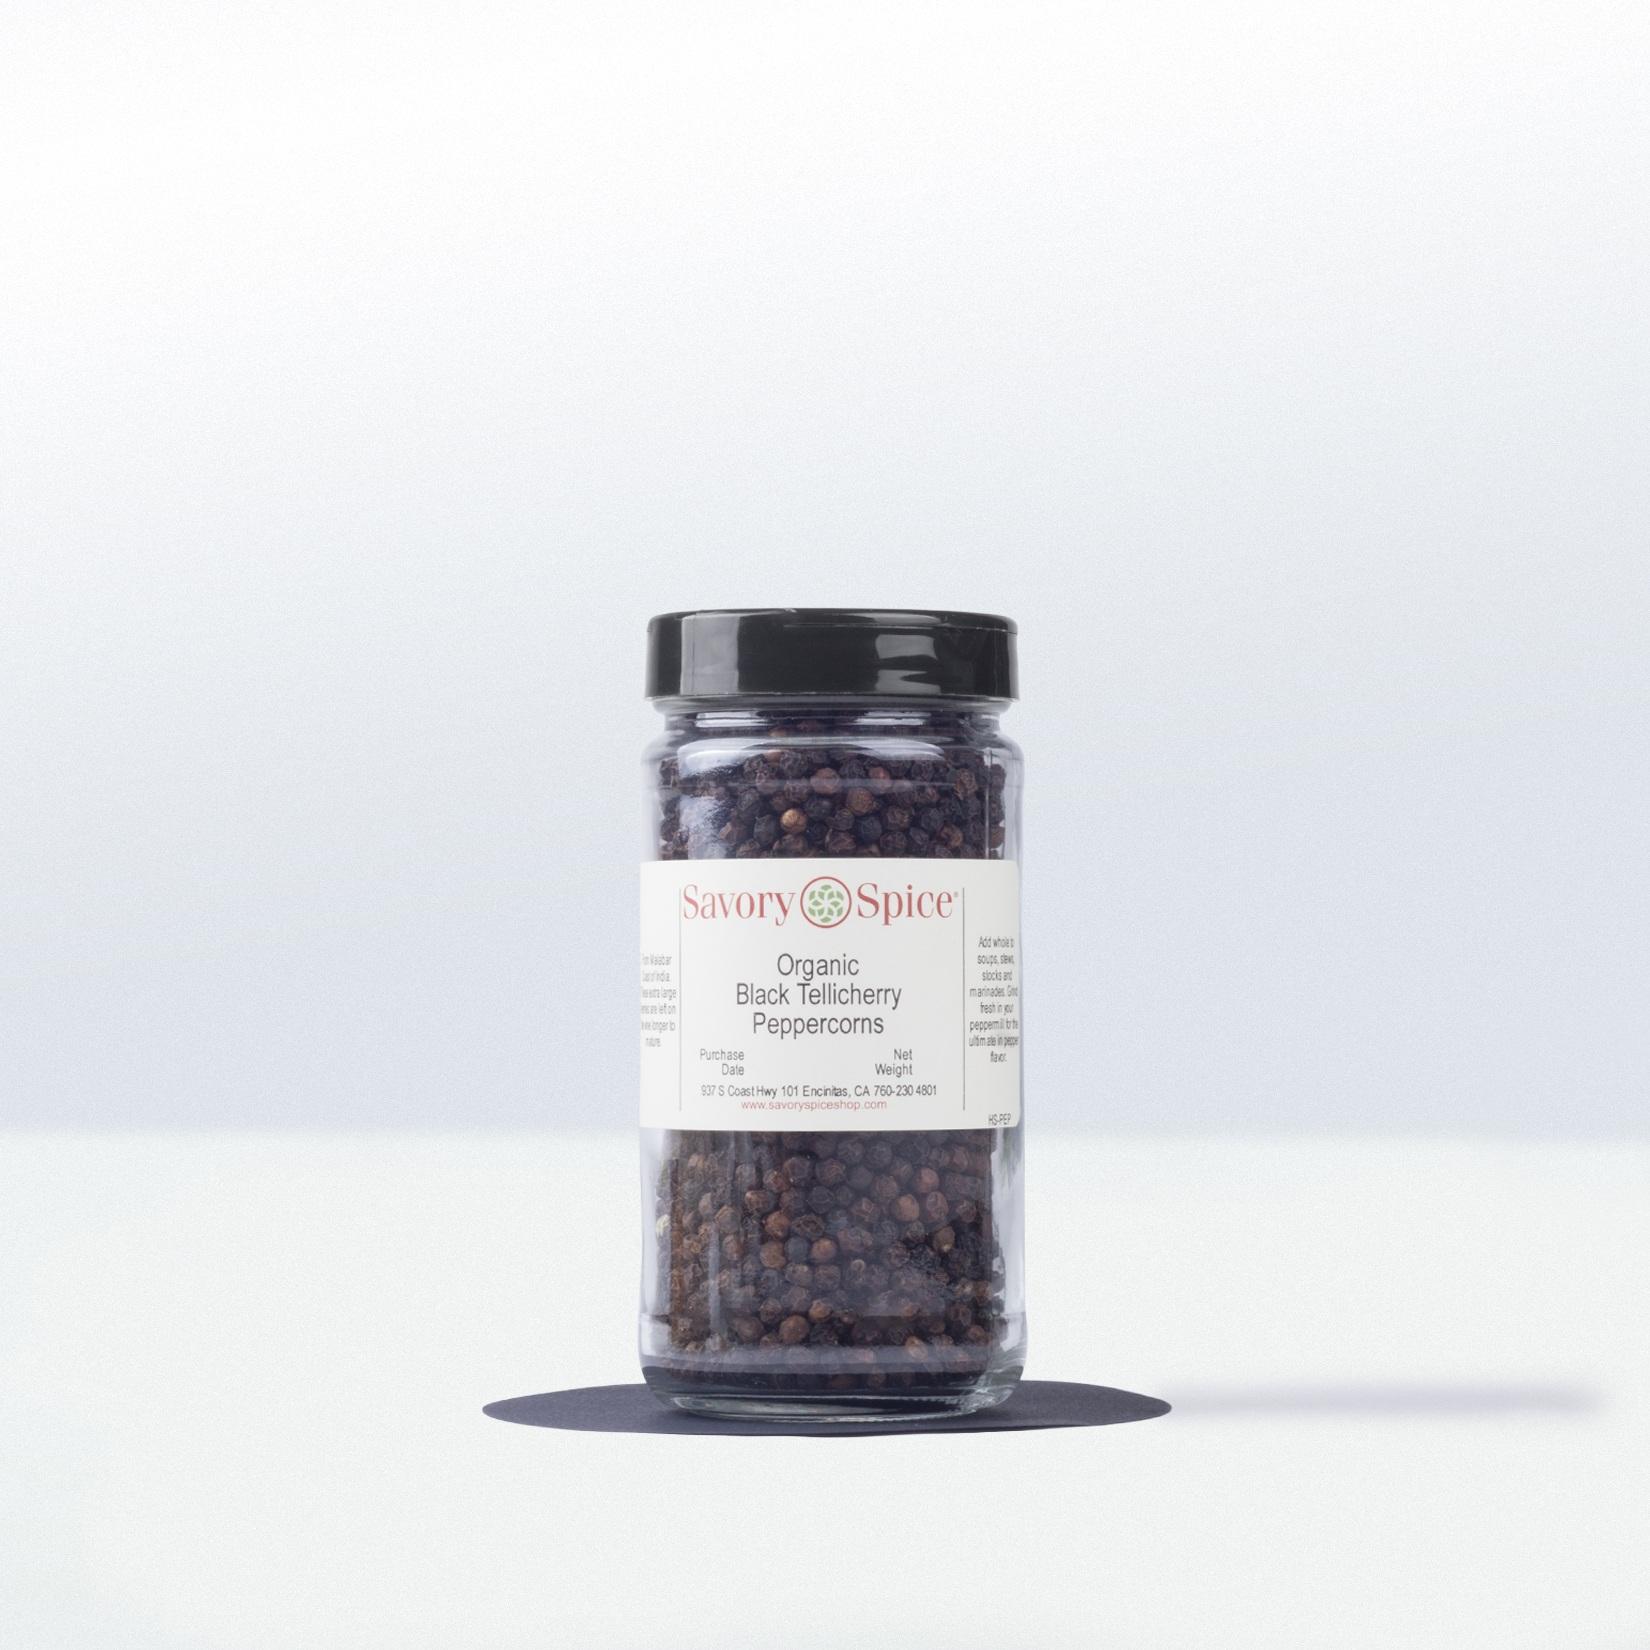 Savory Spice-Organic Black TellicherryPeppercorns